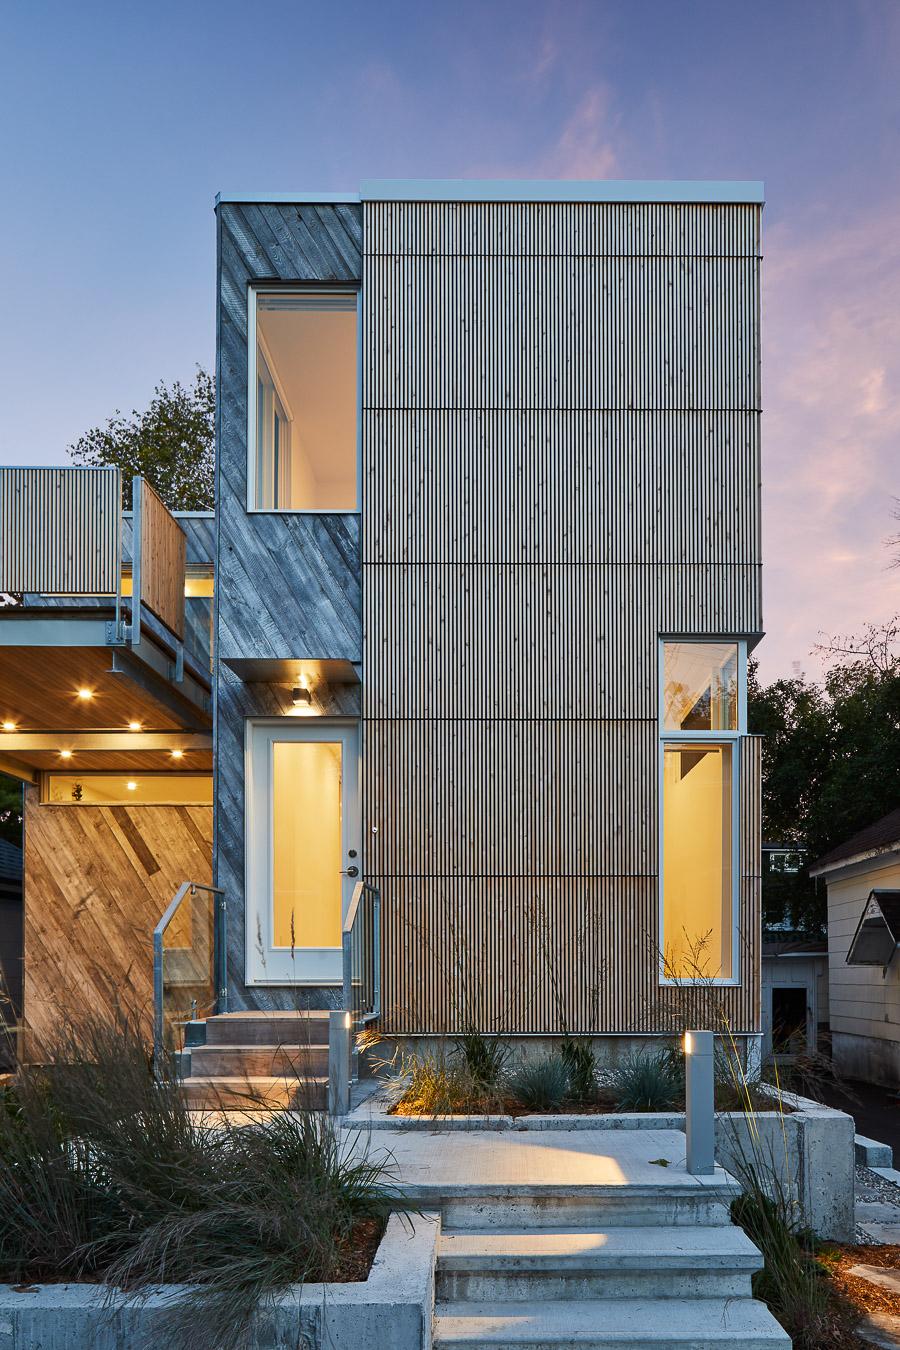 045-Shean Architects Fentiman.jpg